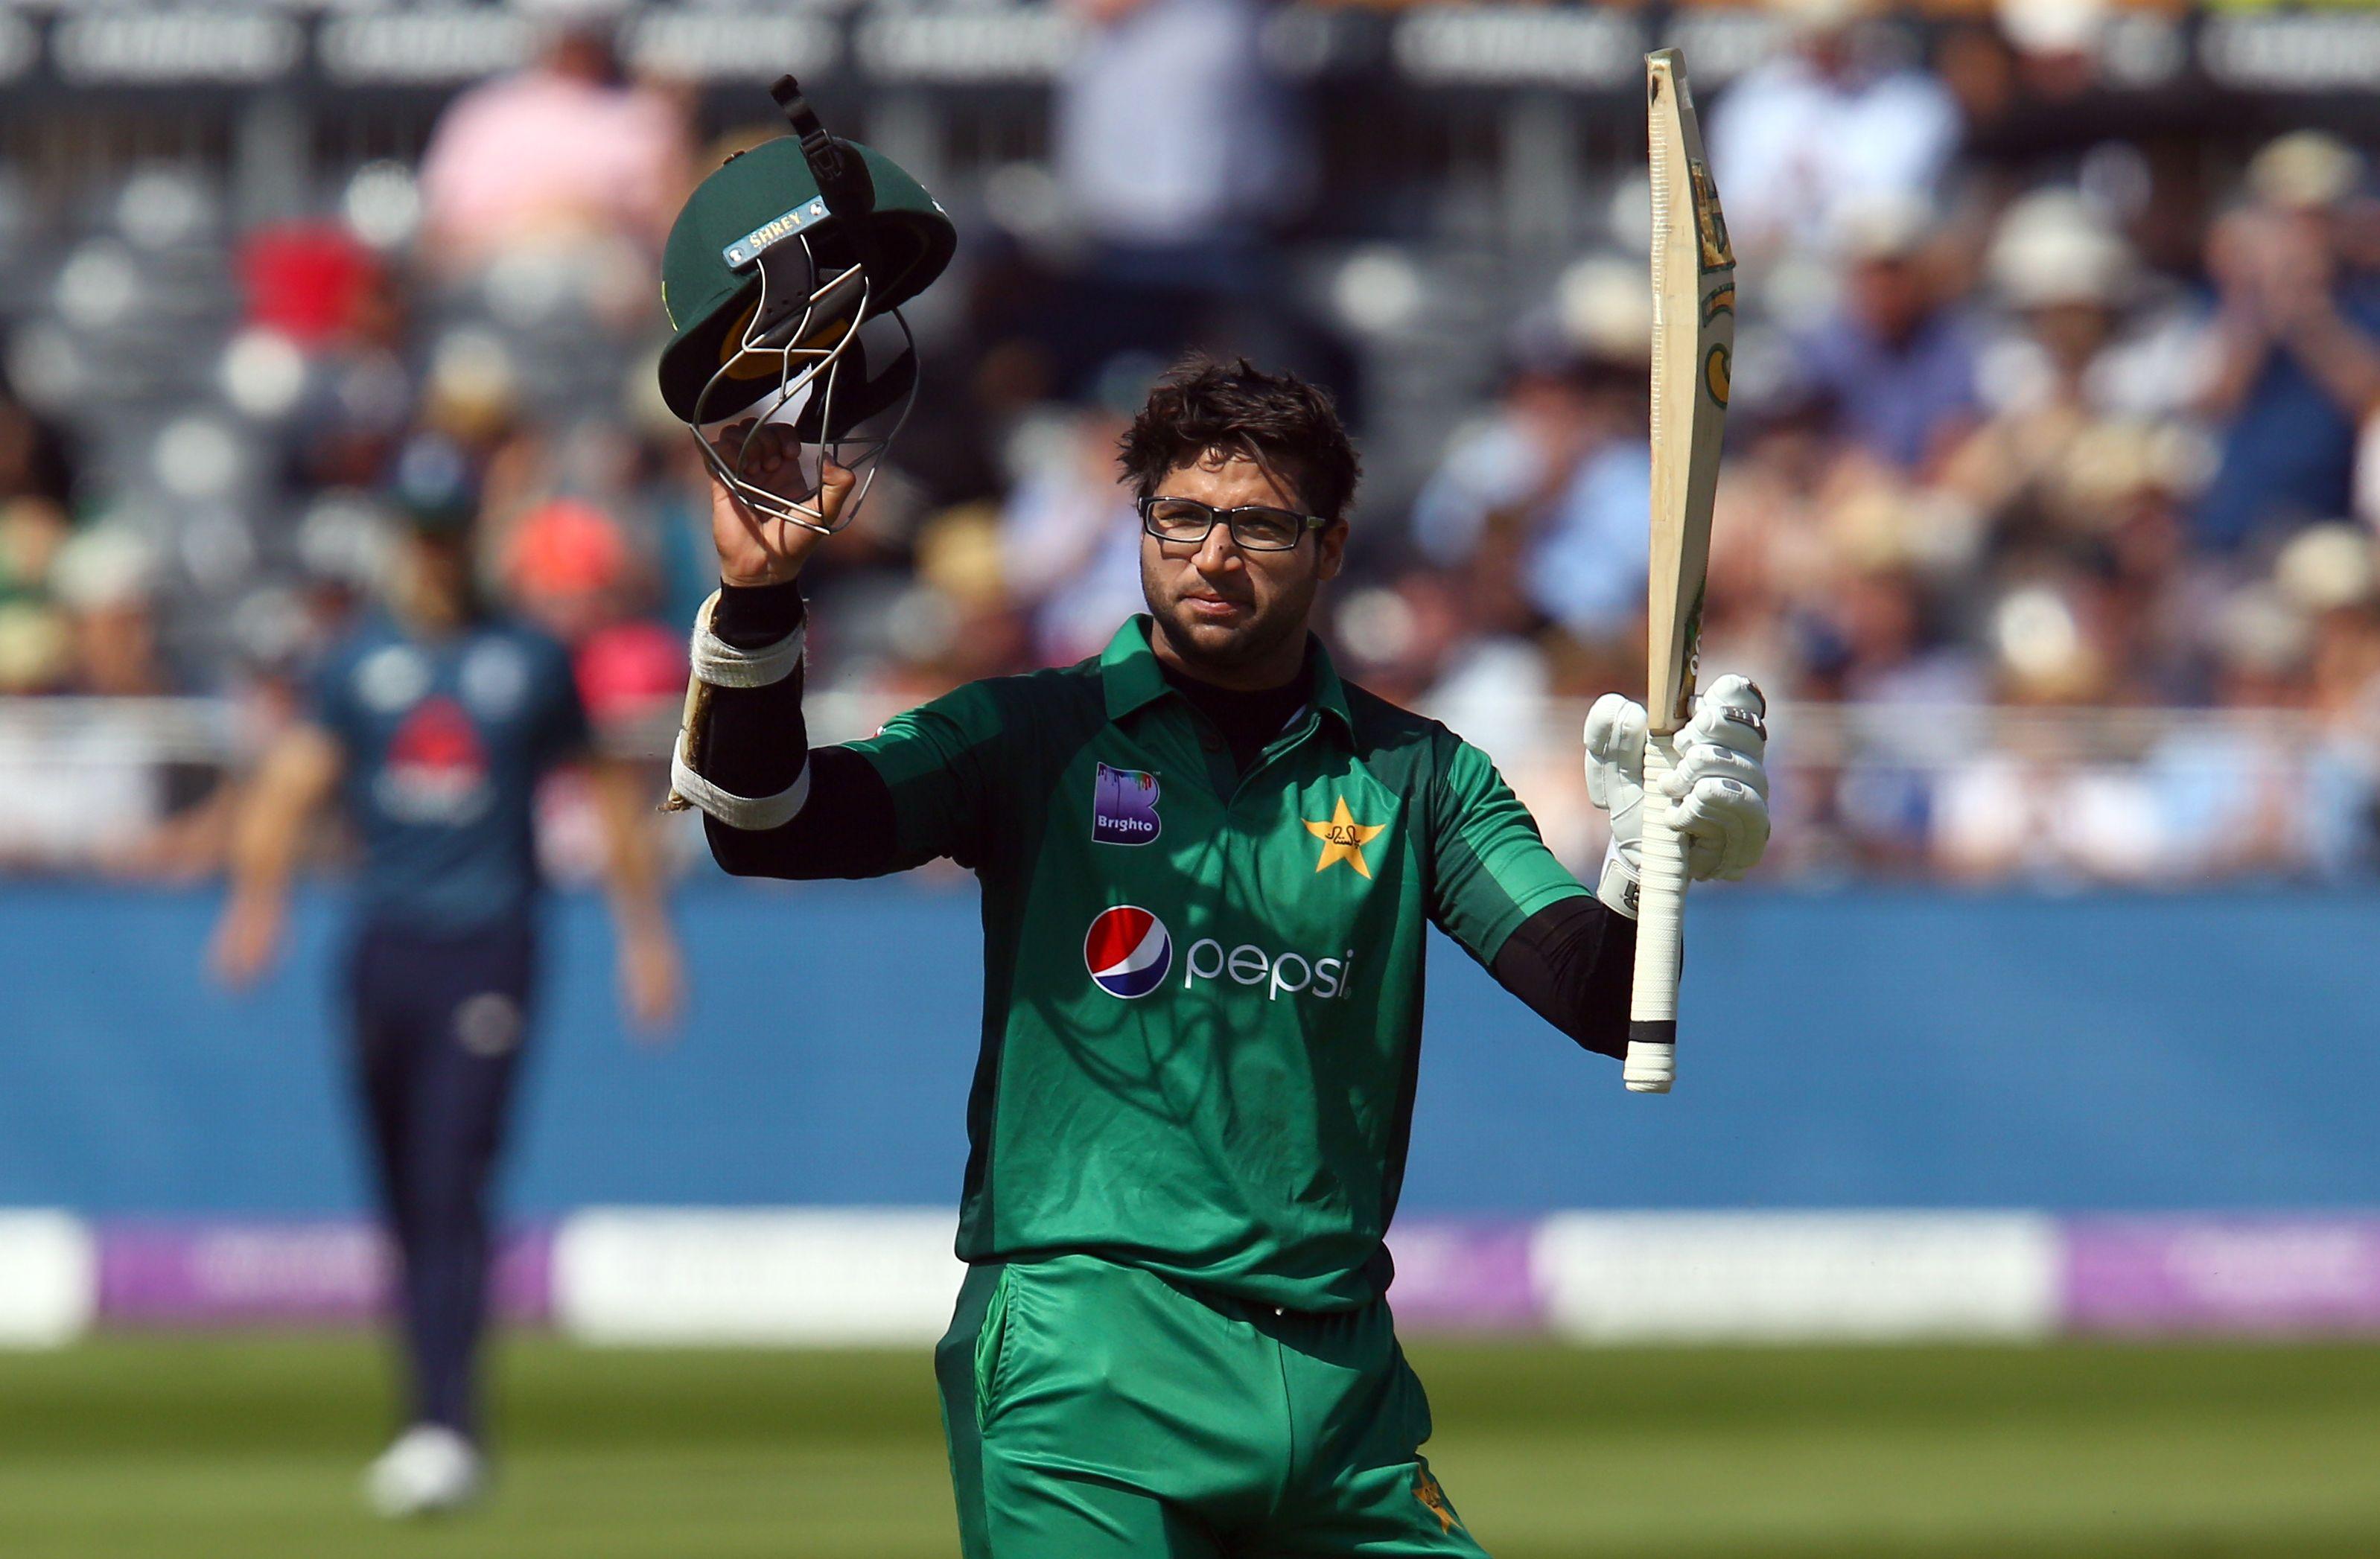 Imam-ul-Haq breaks former Indian captain Kapil Dev's 36-year-old record